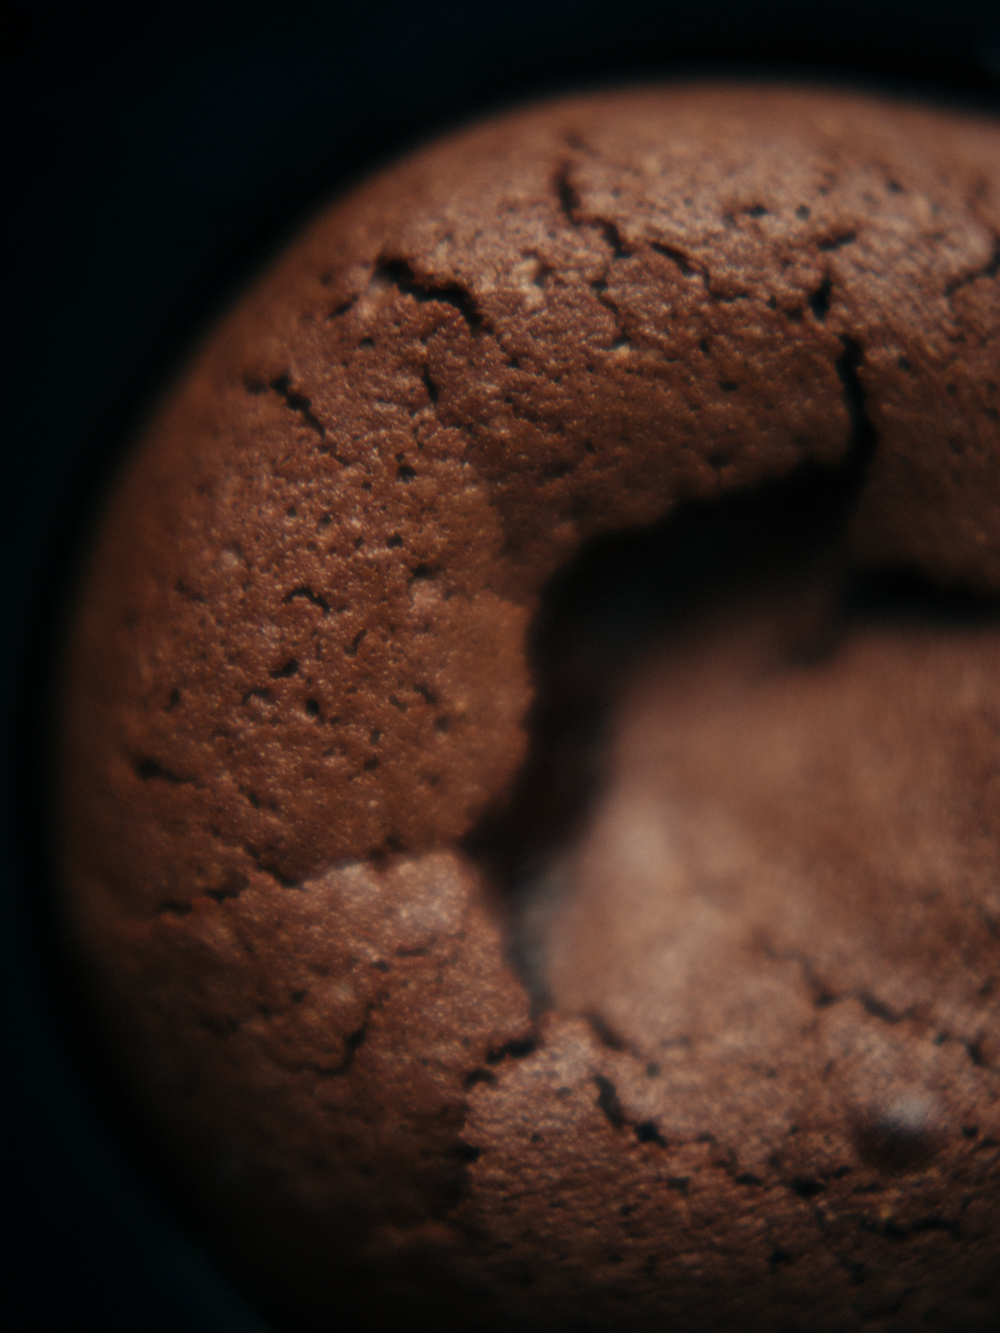 gluten-free-chocolate-molten-cake-celine_chhuon_photography_copyright-11.jpg